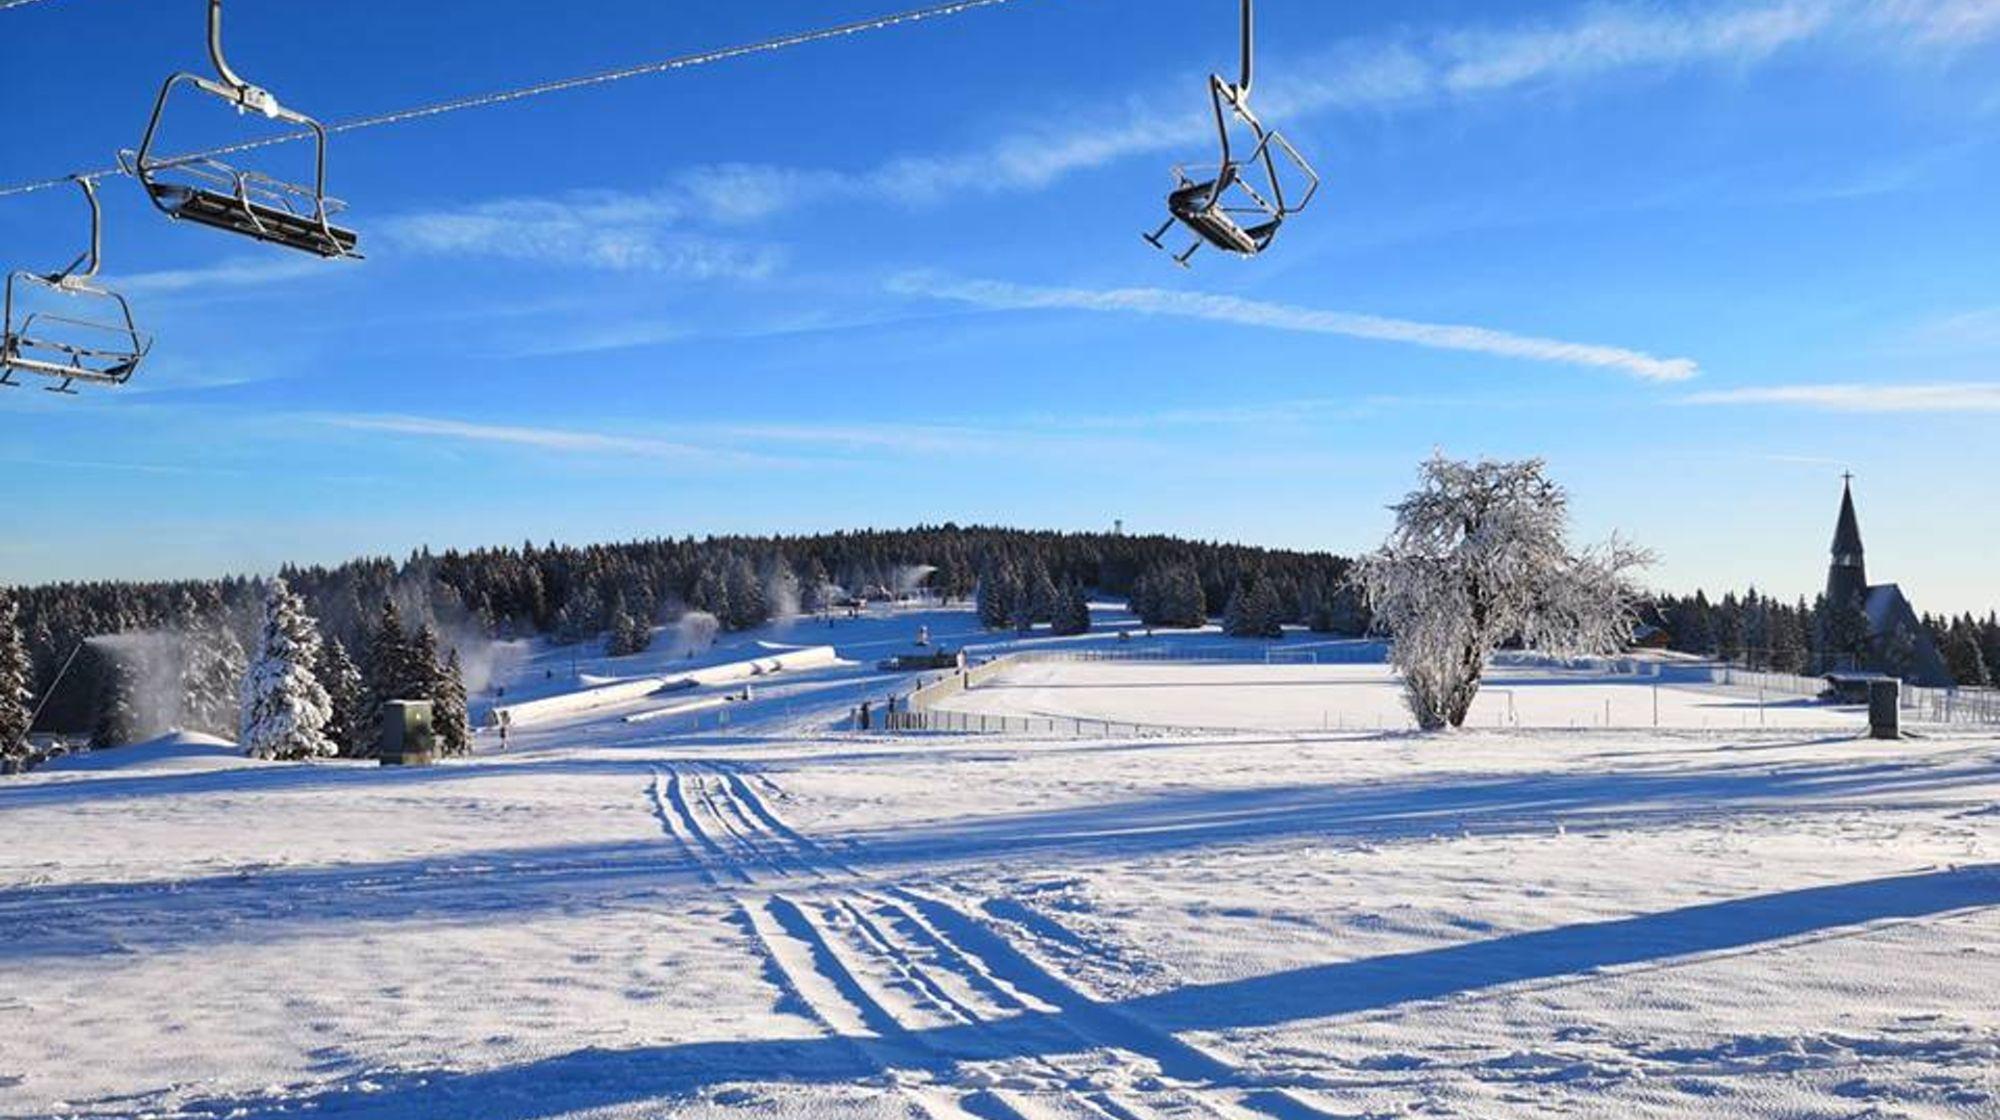 Start of ski season on Saturday, December 1st